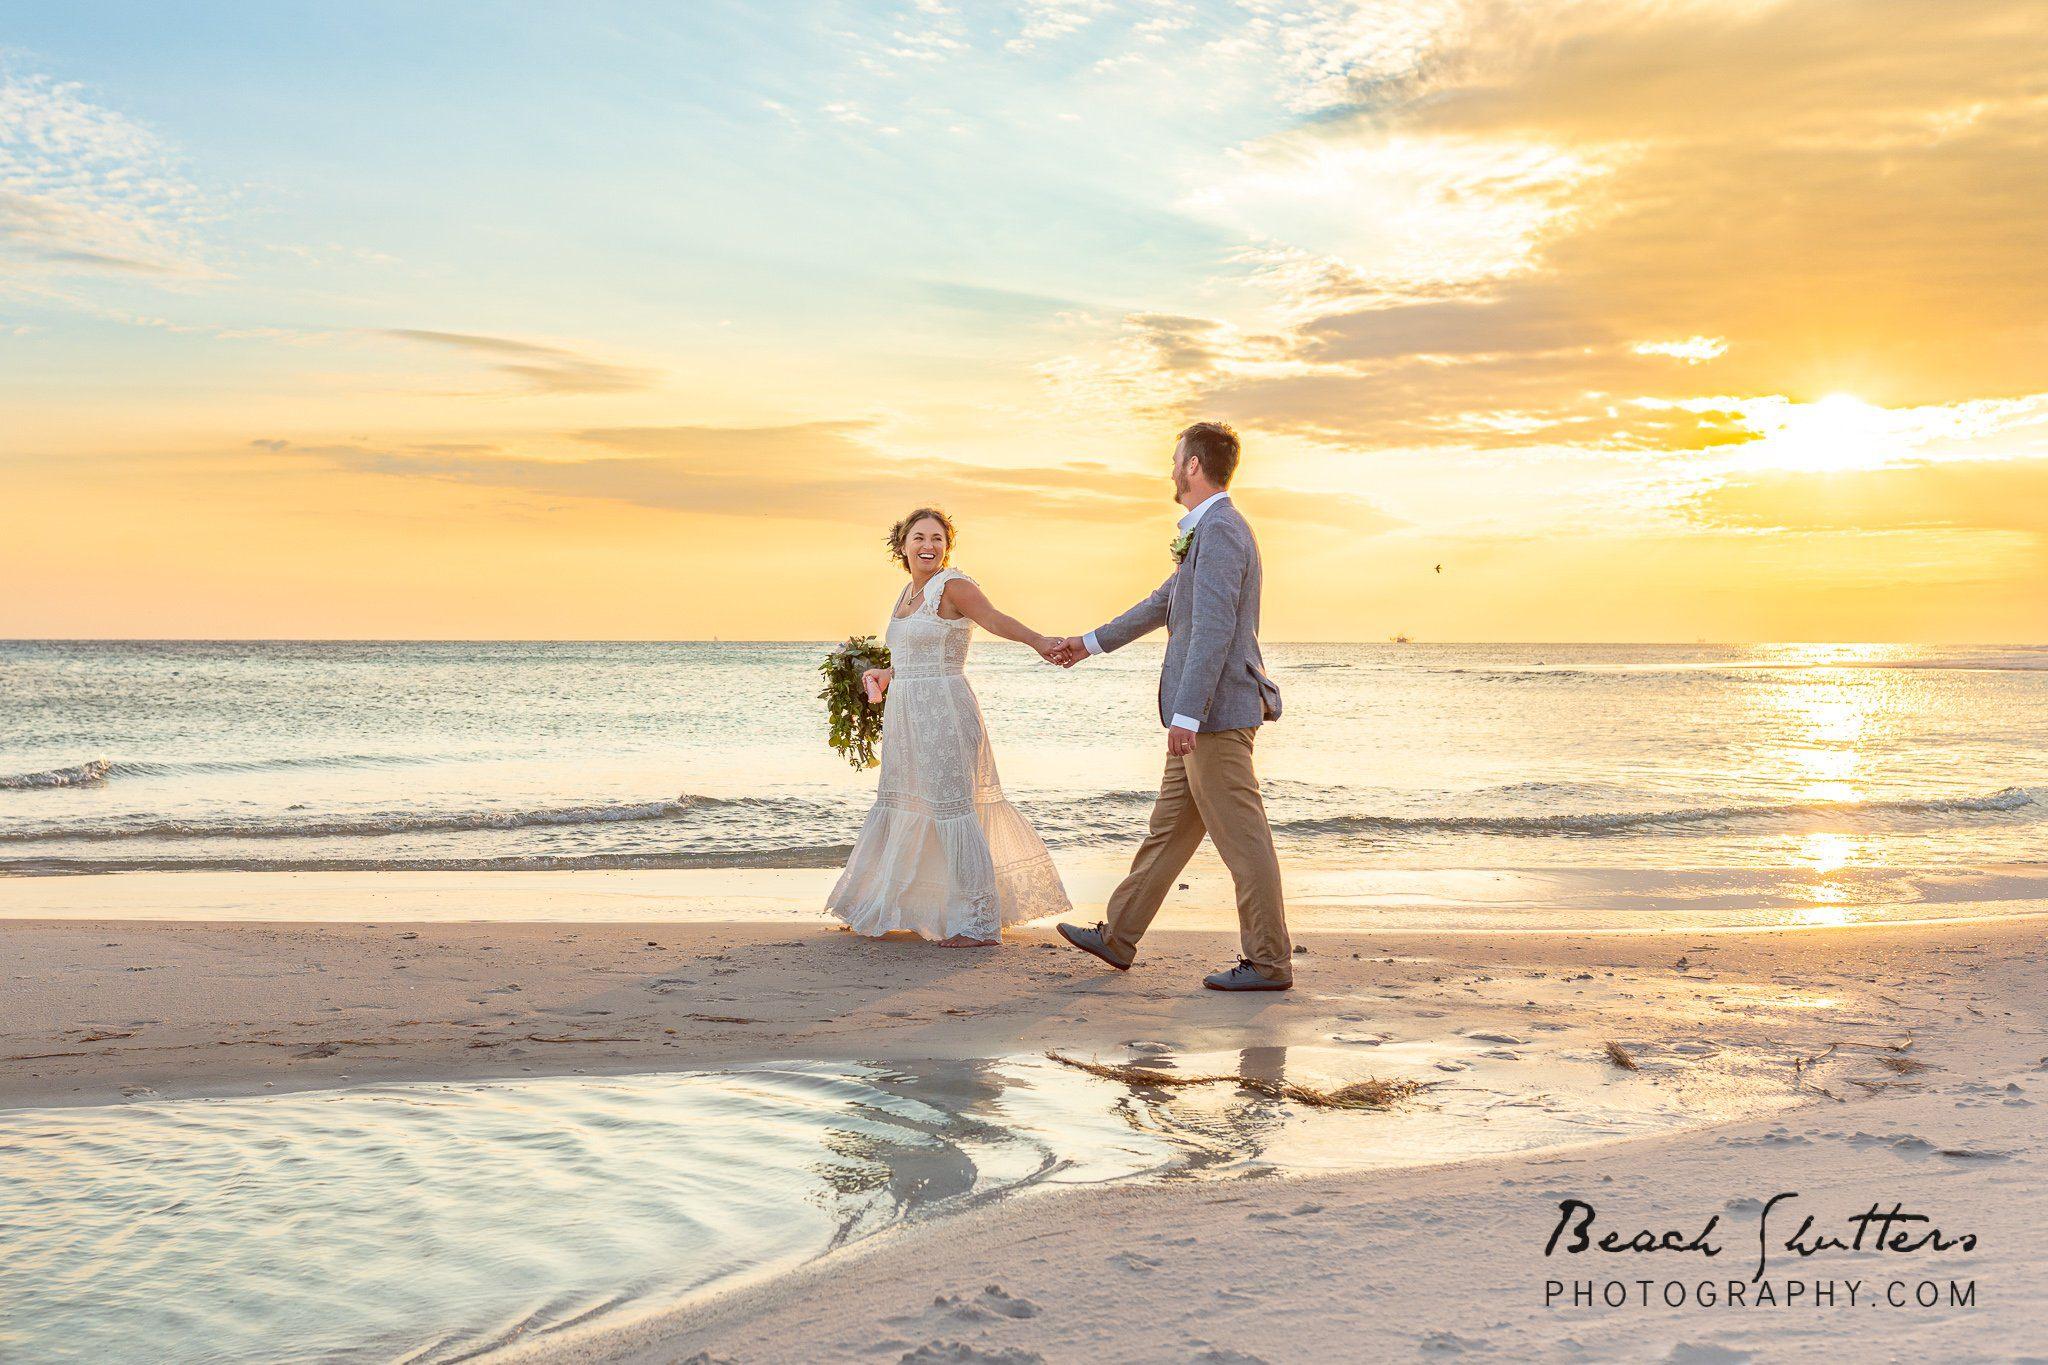 beach weddings in Alabama